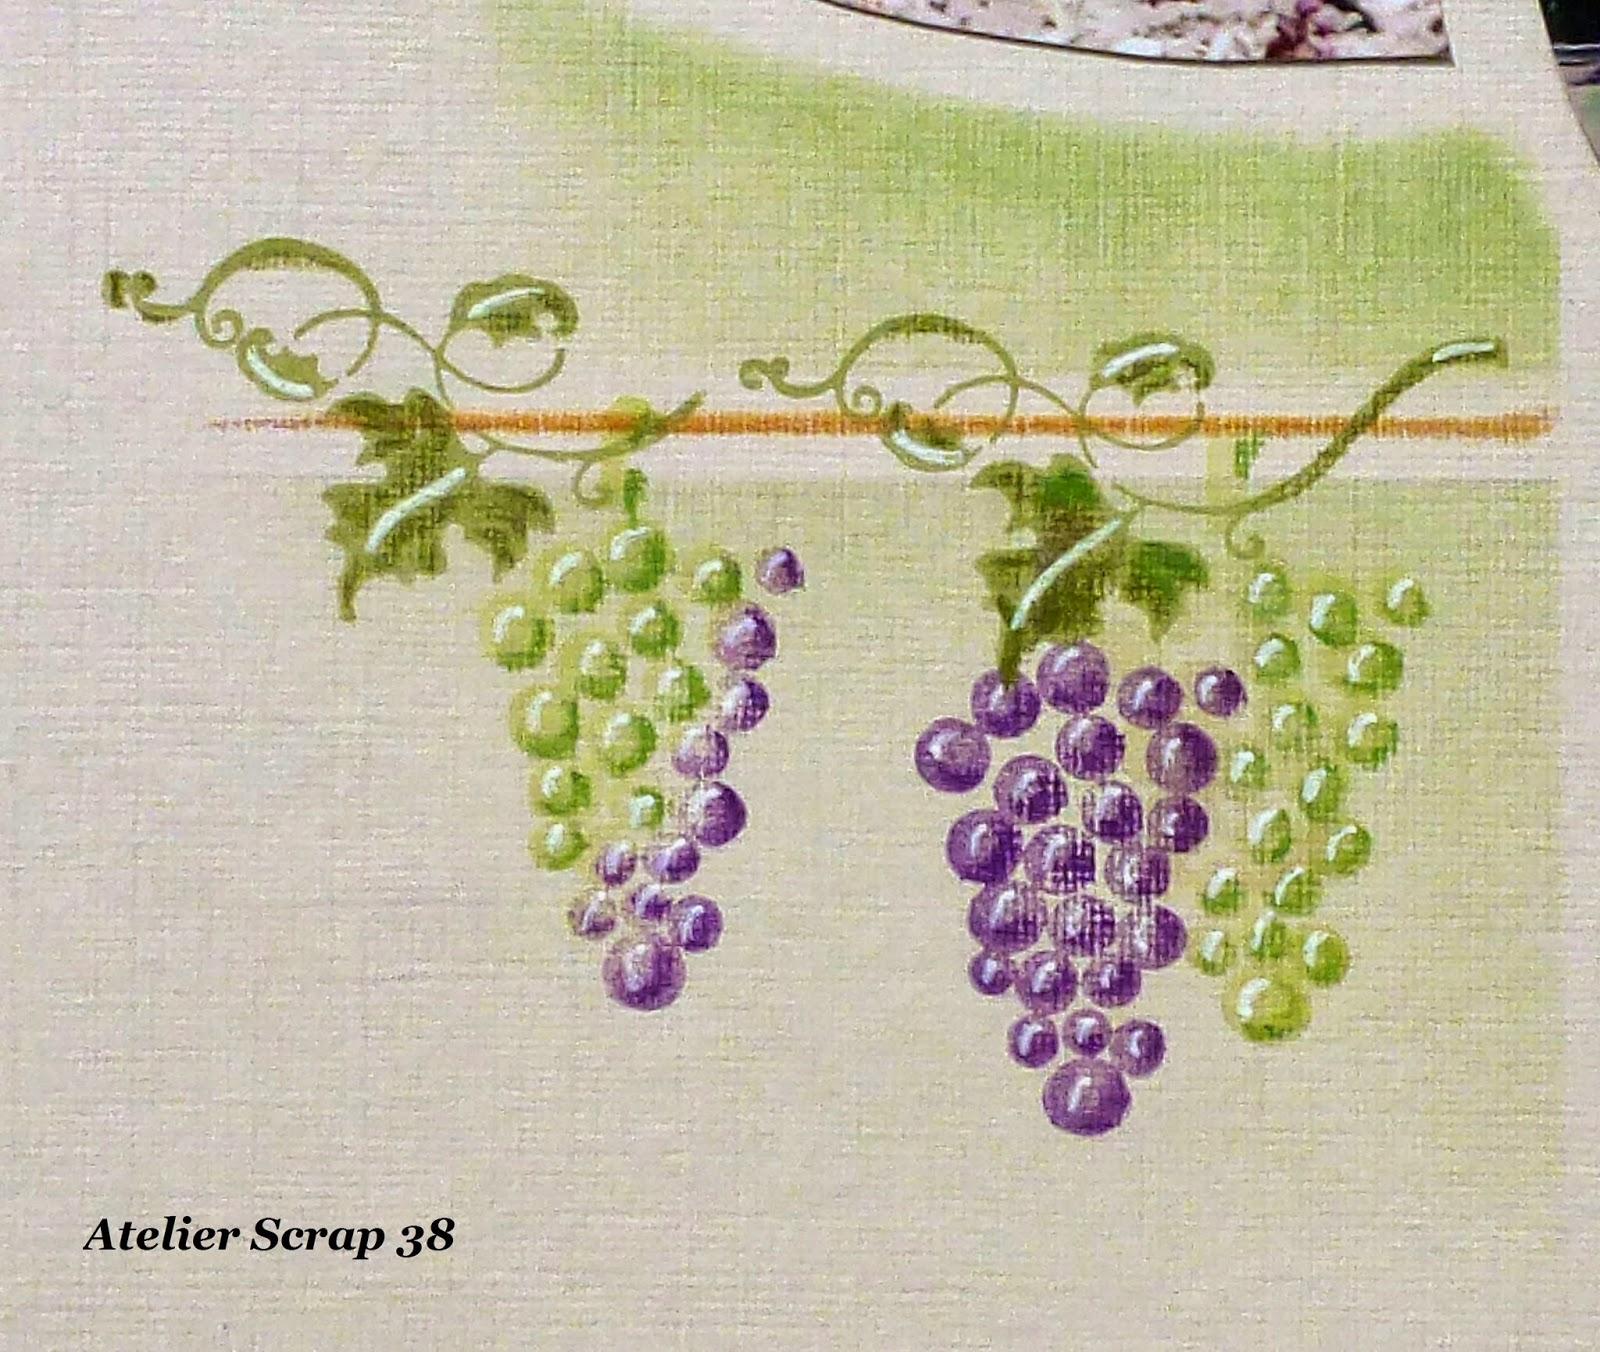 grapesatelier-scrap-38